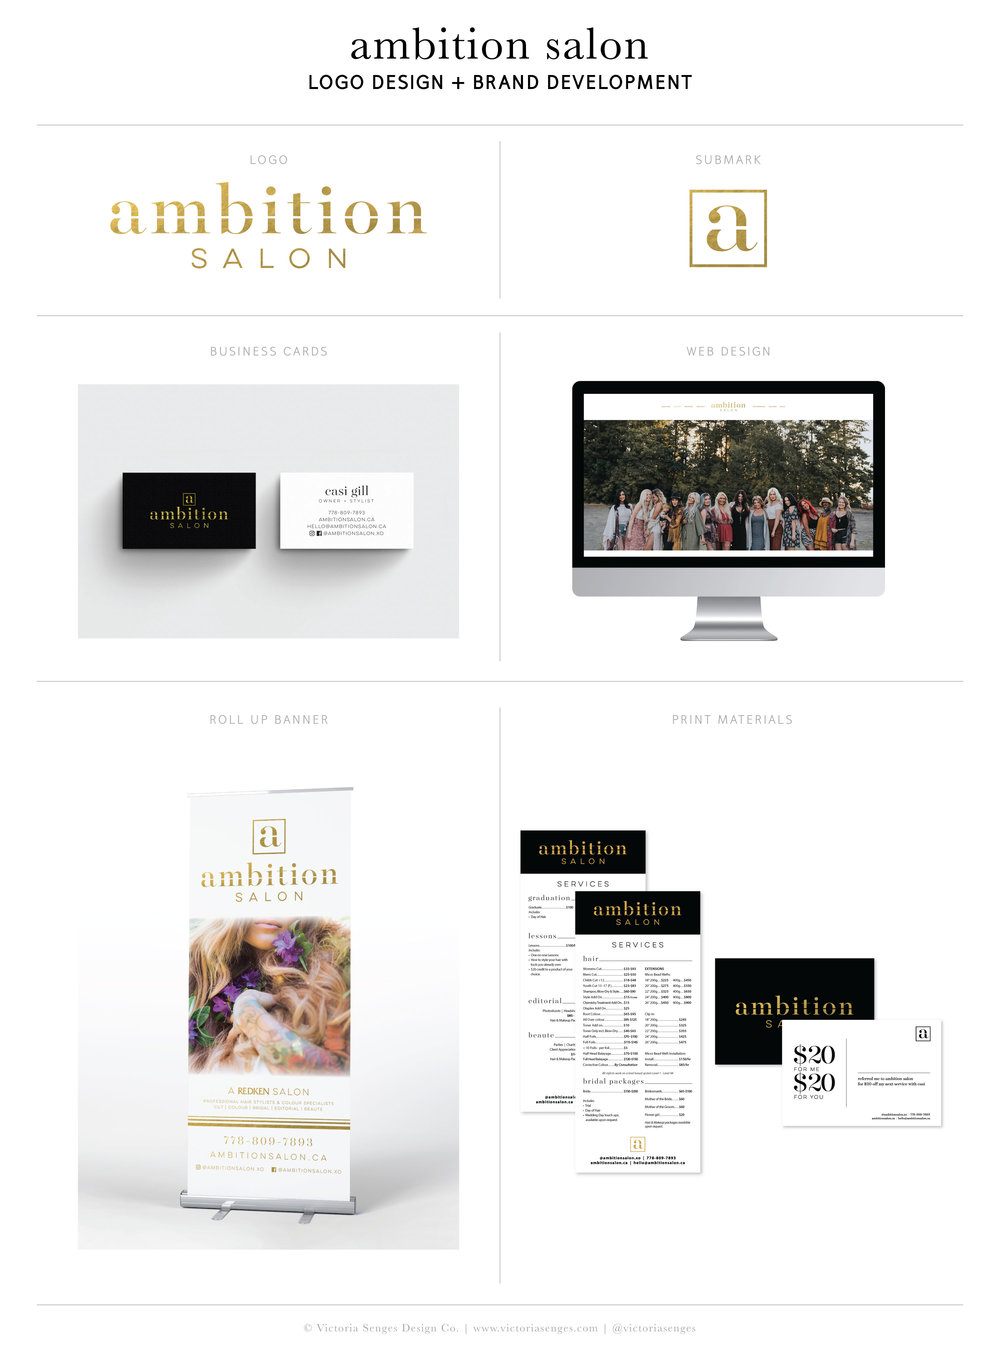 ambitionsalon-branding.jpg